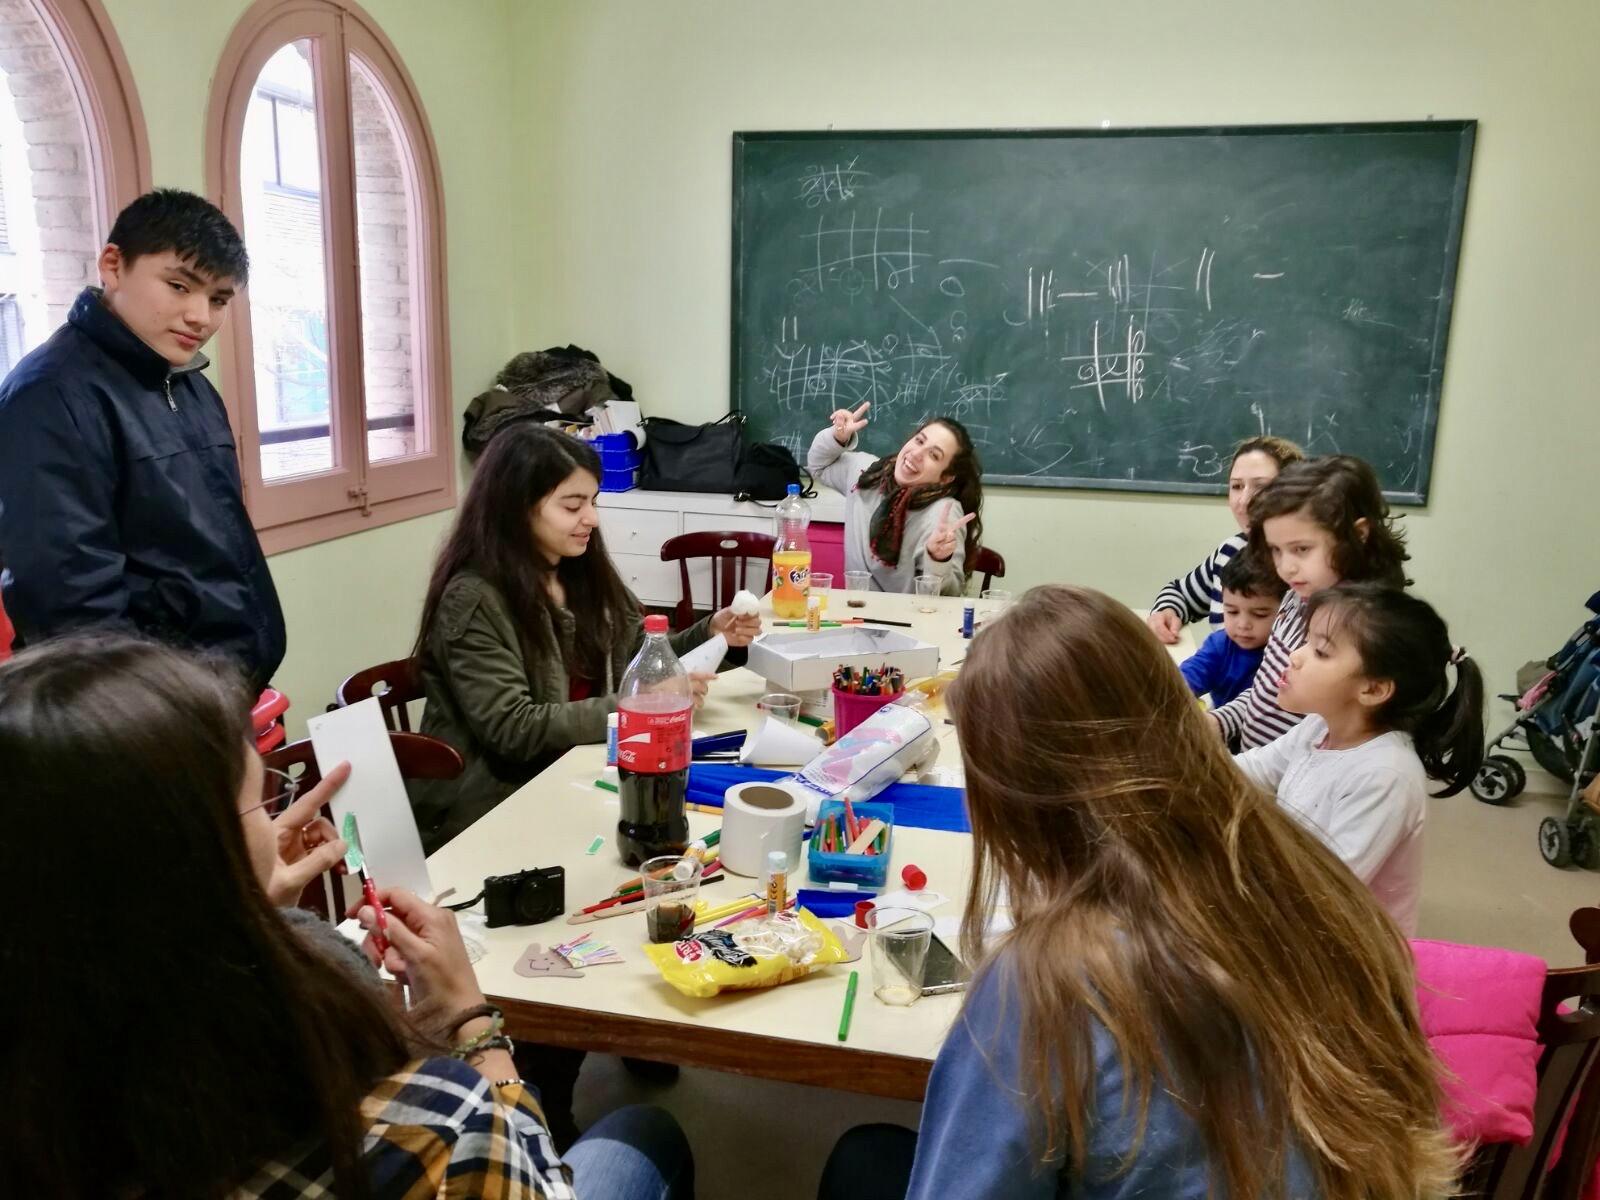 Centre Socioeducatiu a la Sagrera